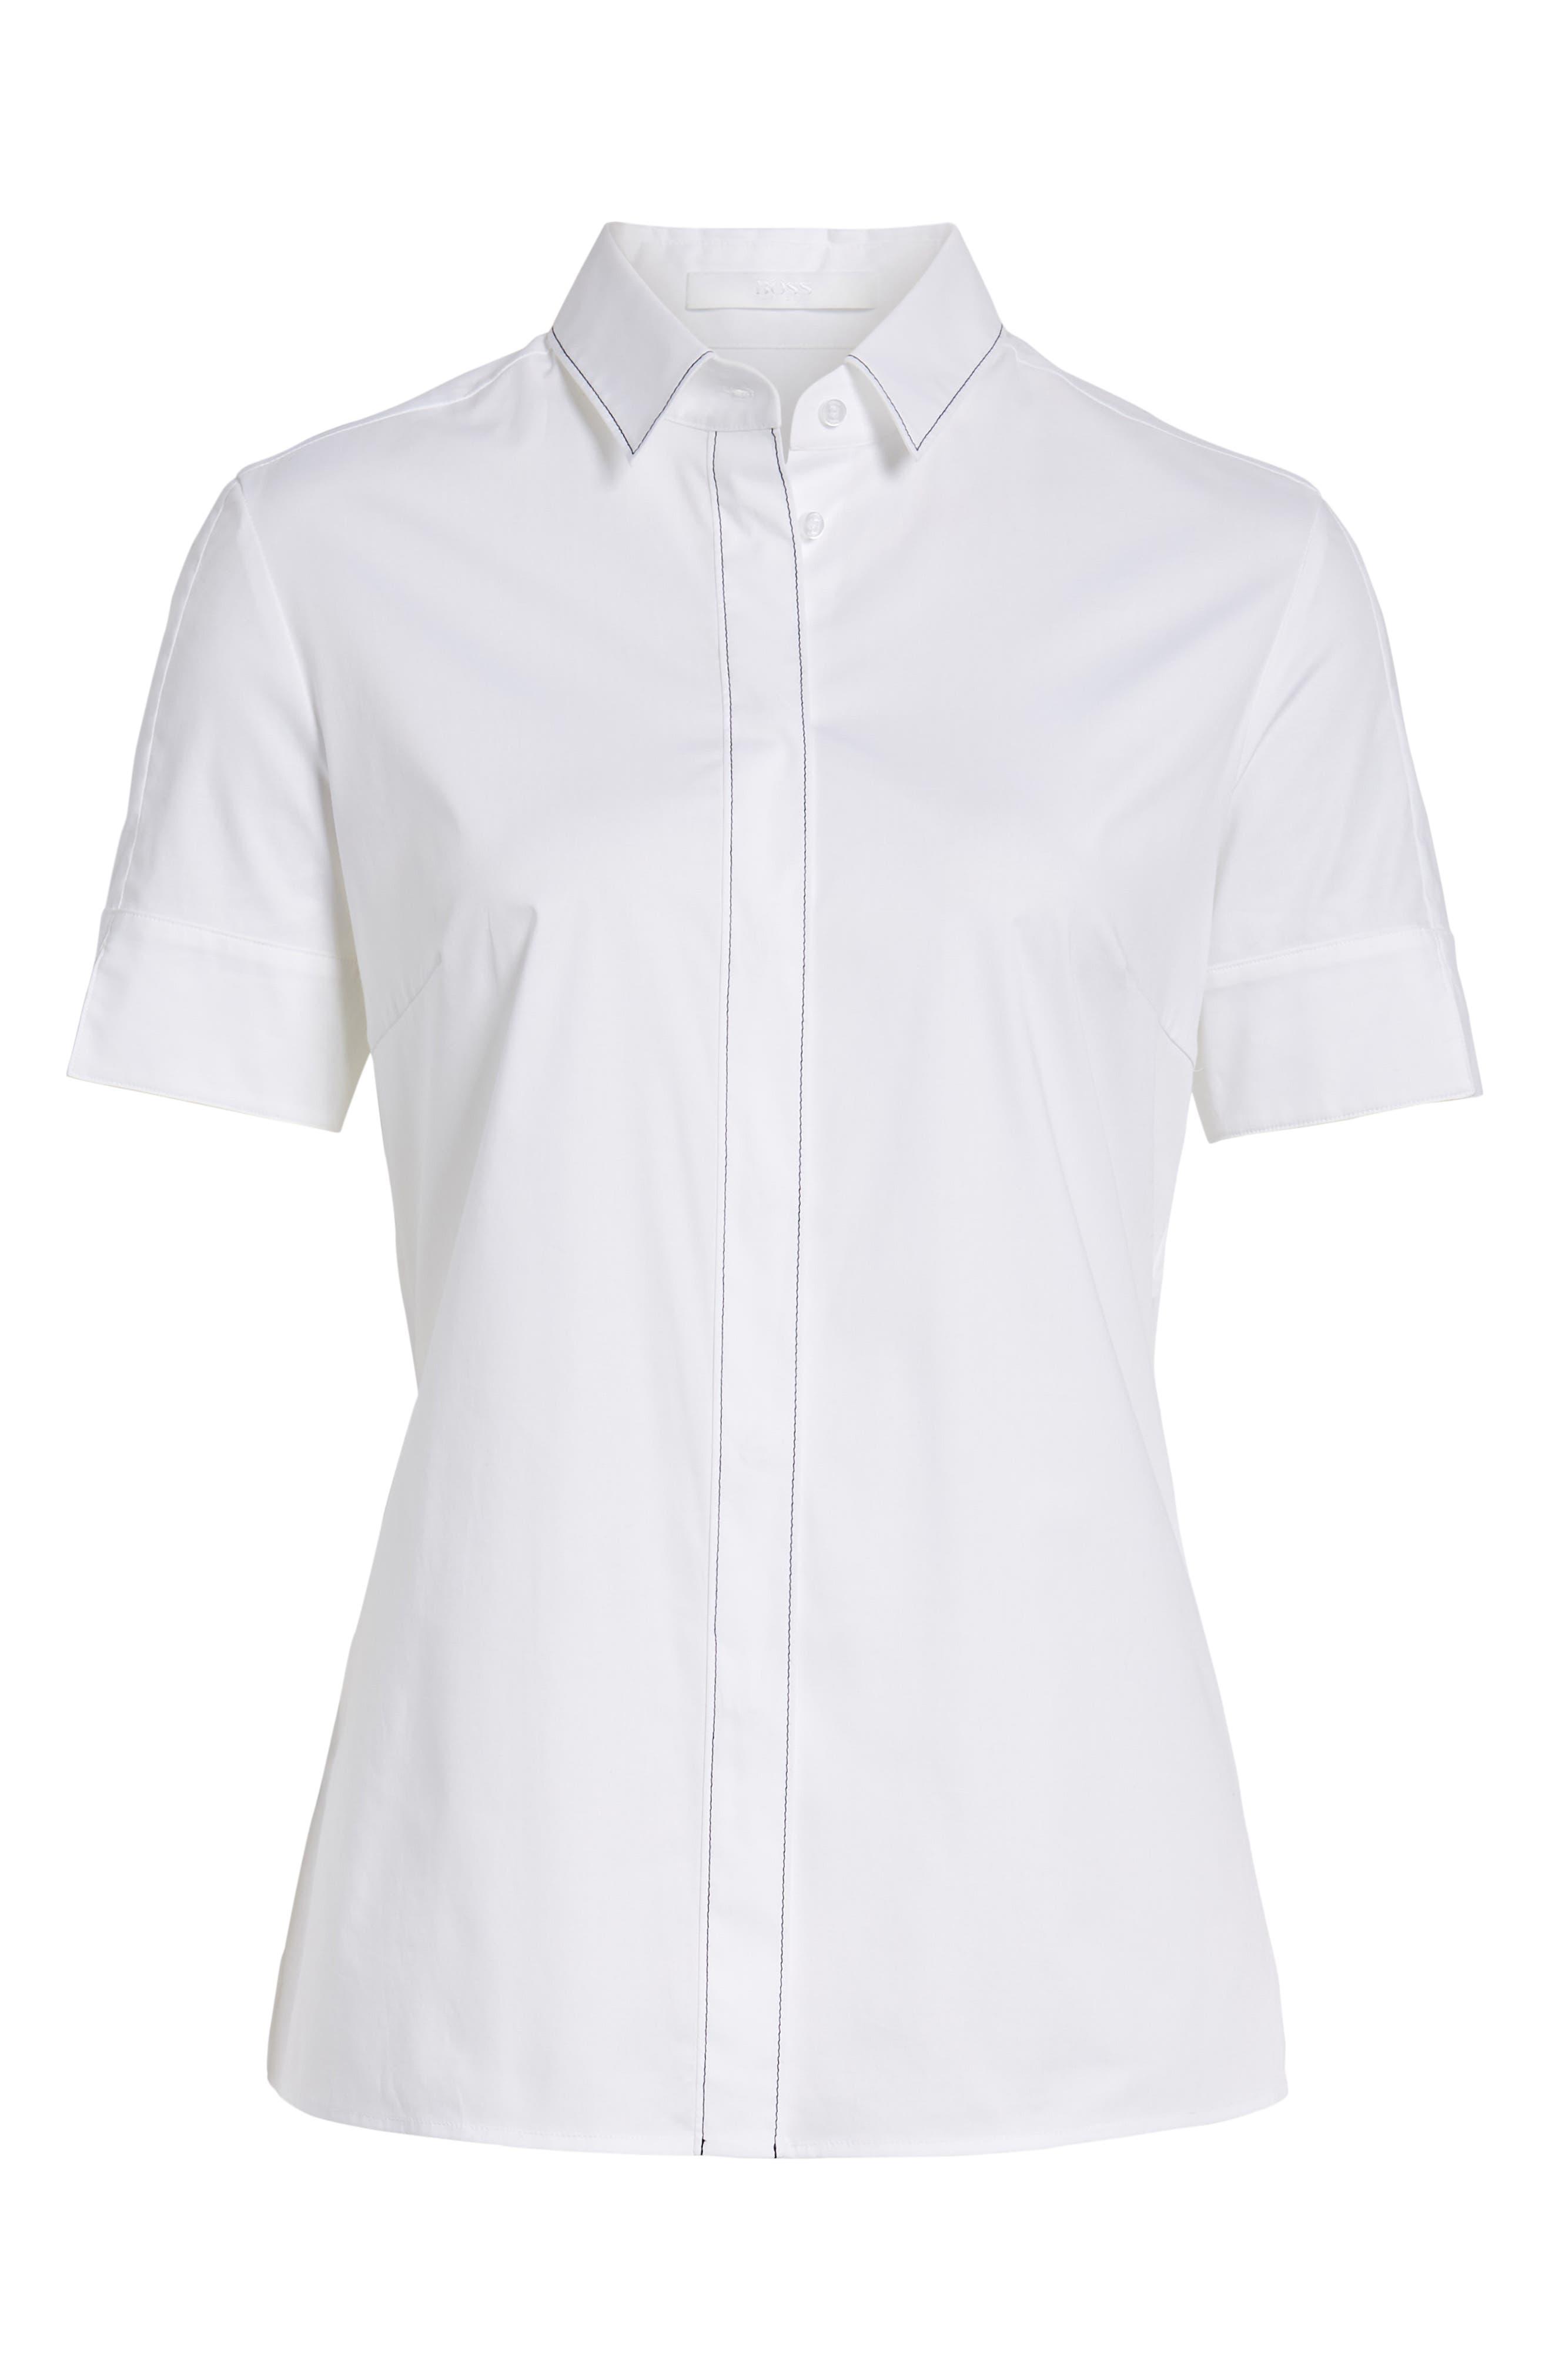 Balasera Stretch Cotton Blouse,                             Alternate thumbnail 7, color,                             White